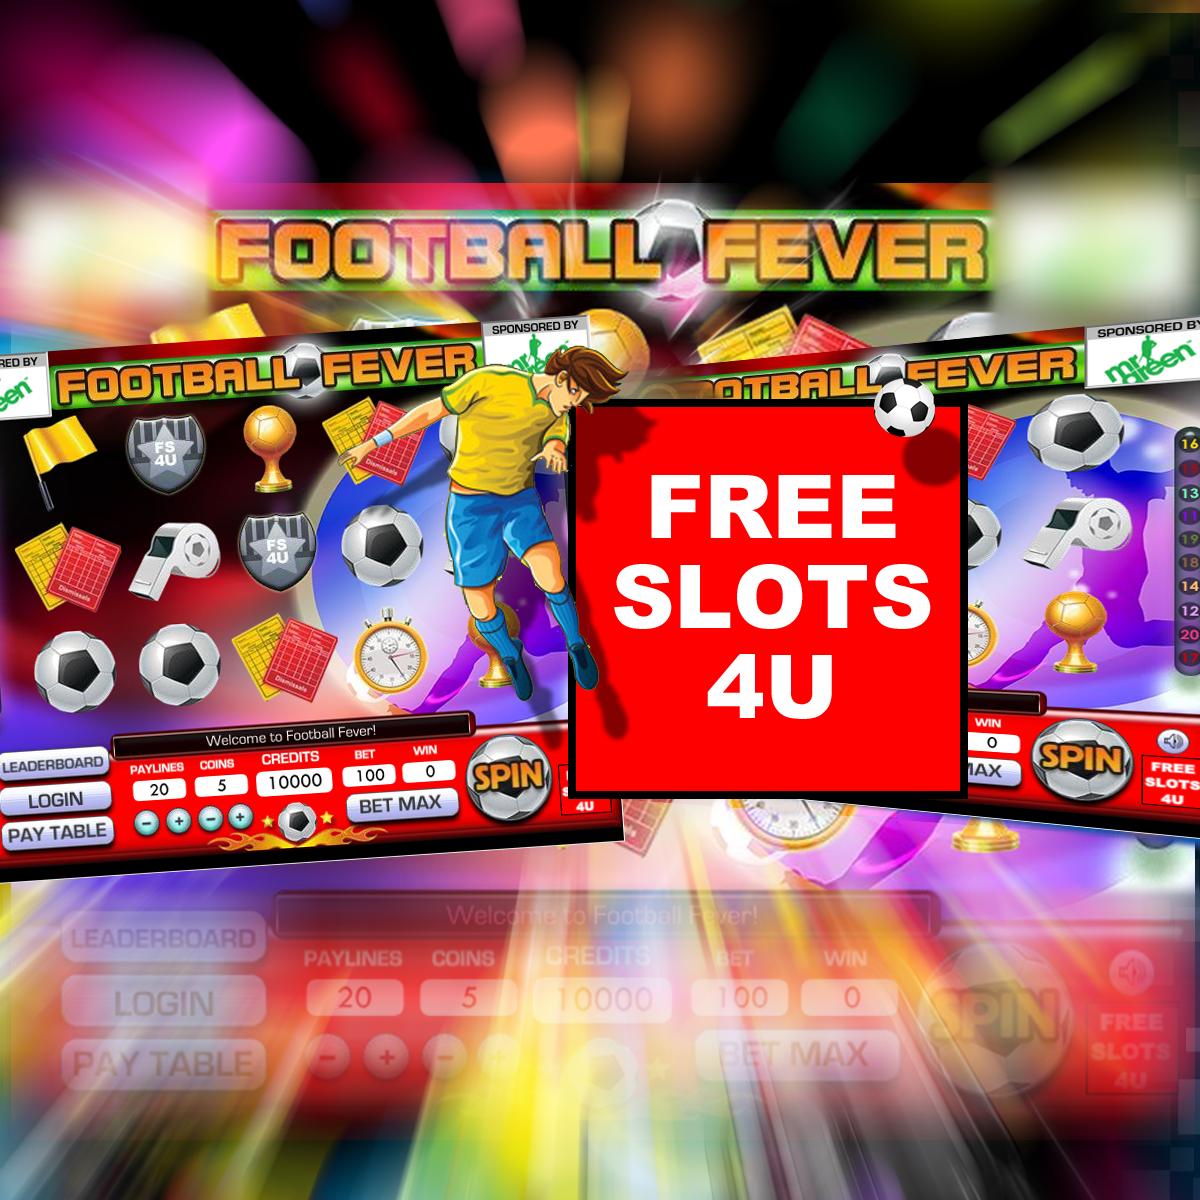 Spiele Football Fever - Video Slots Online